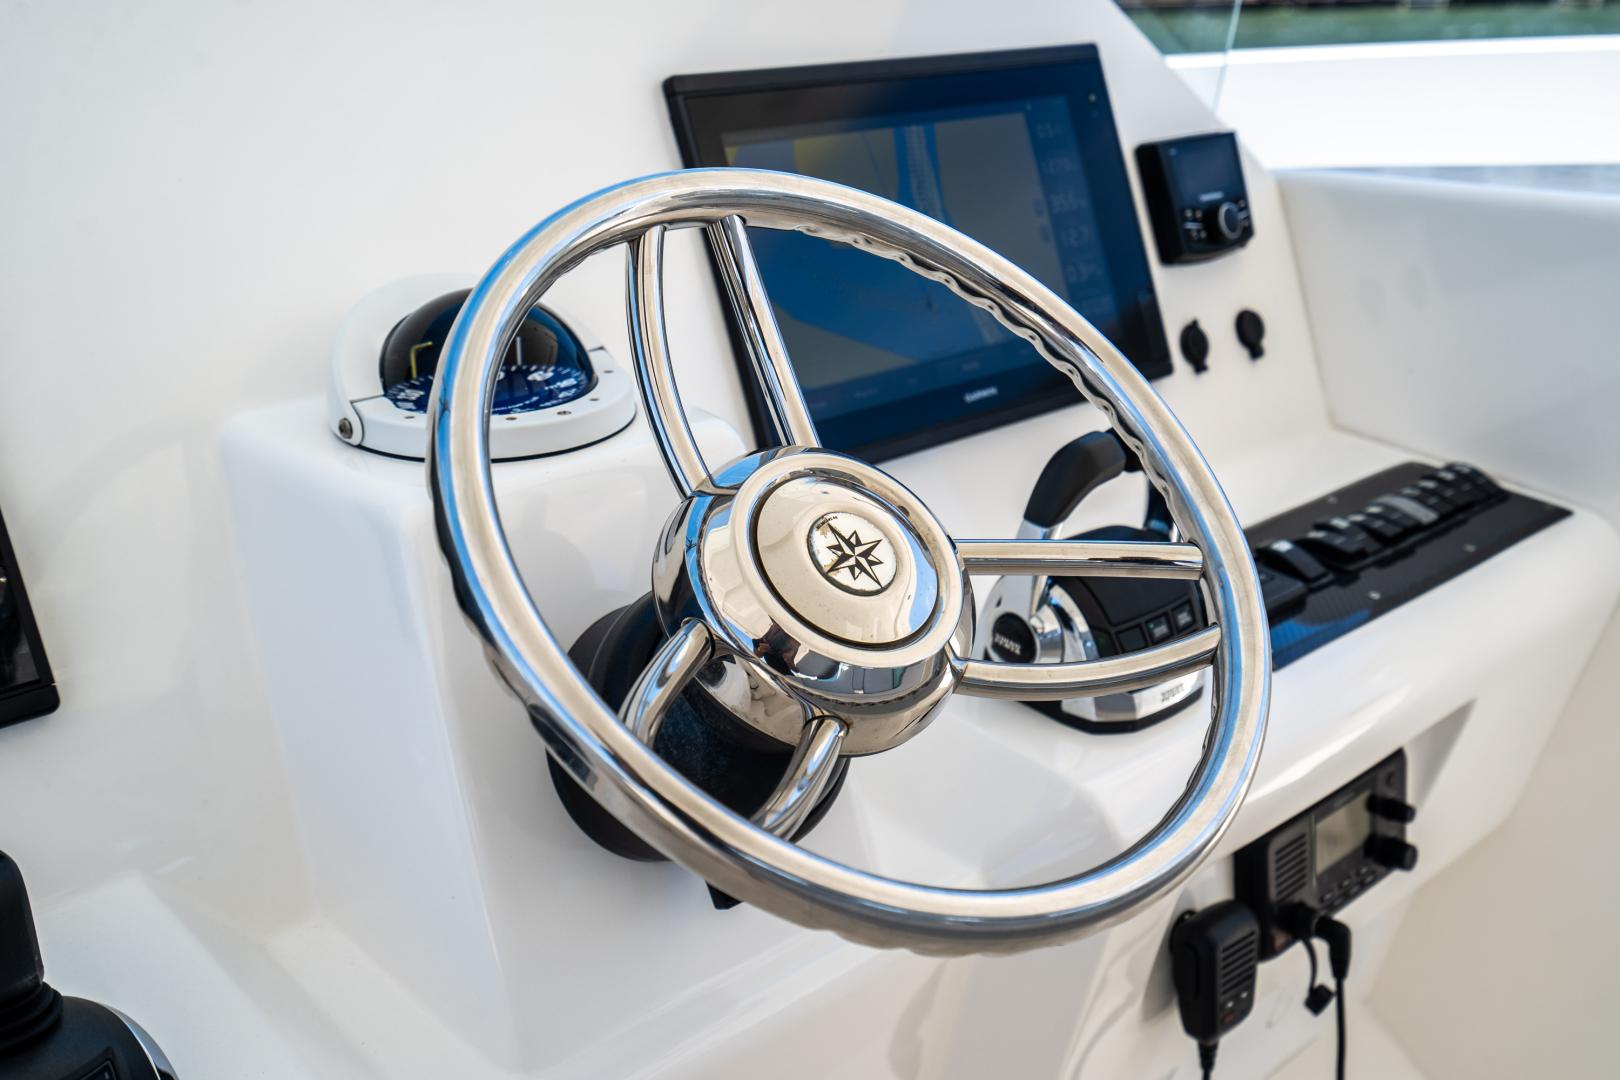 Overblue-58 Power Catamaran 2017-Techuila Ft. Lauderdale-Florida-United States-2017 Overblue 58 Powercat-1401190   Thumbnail